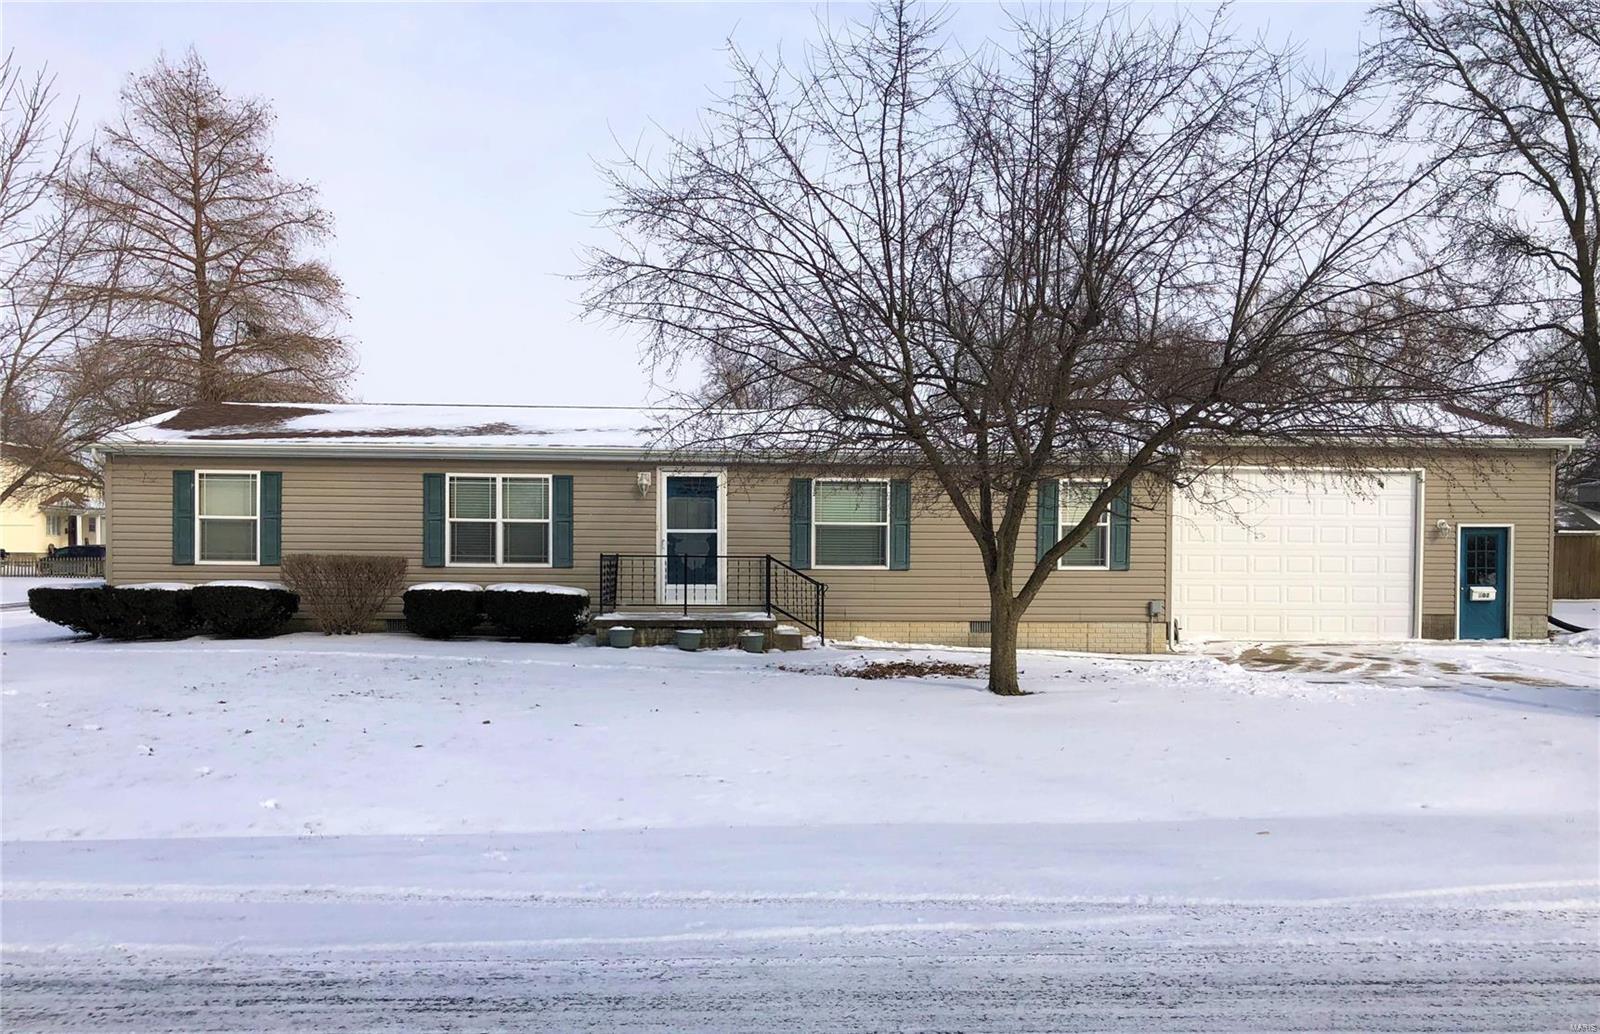 502 8th Street Property Photo - Carrollton, IL real estate listing